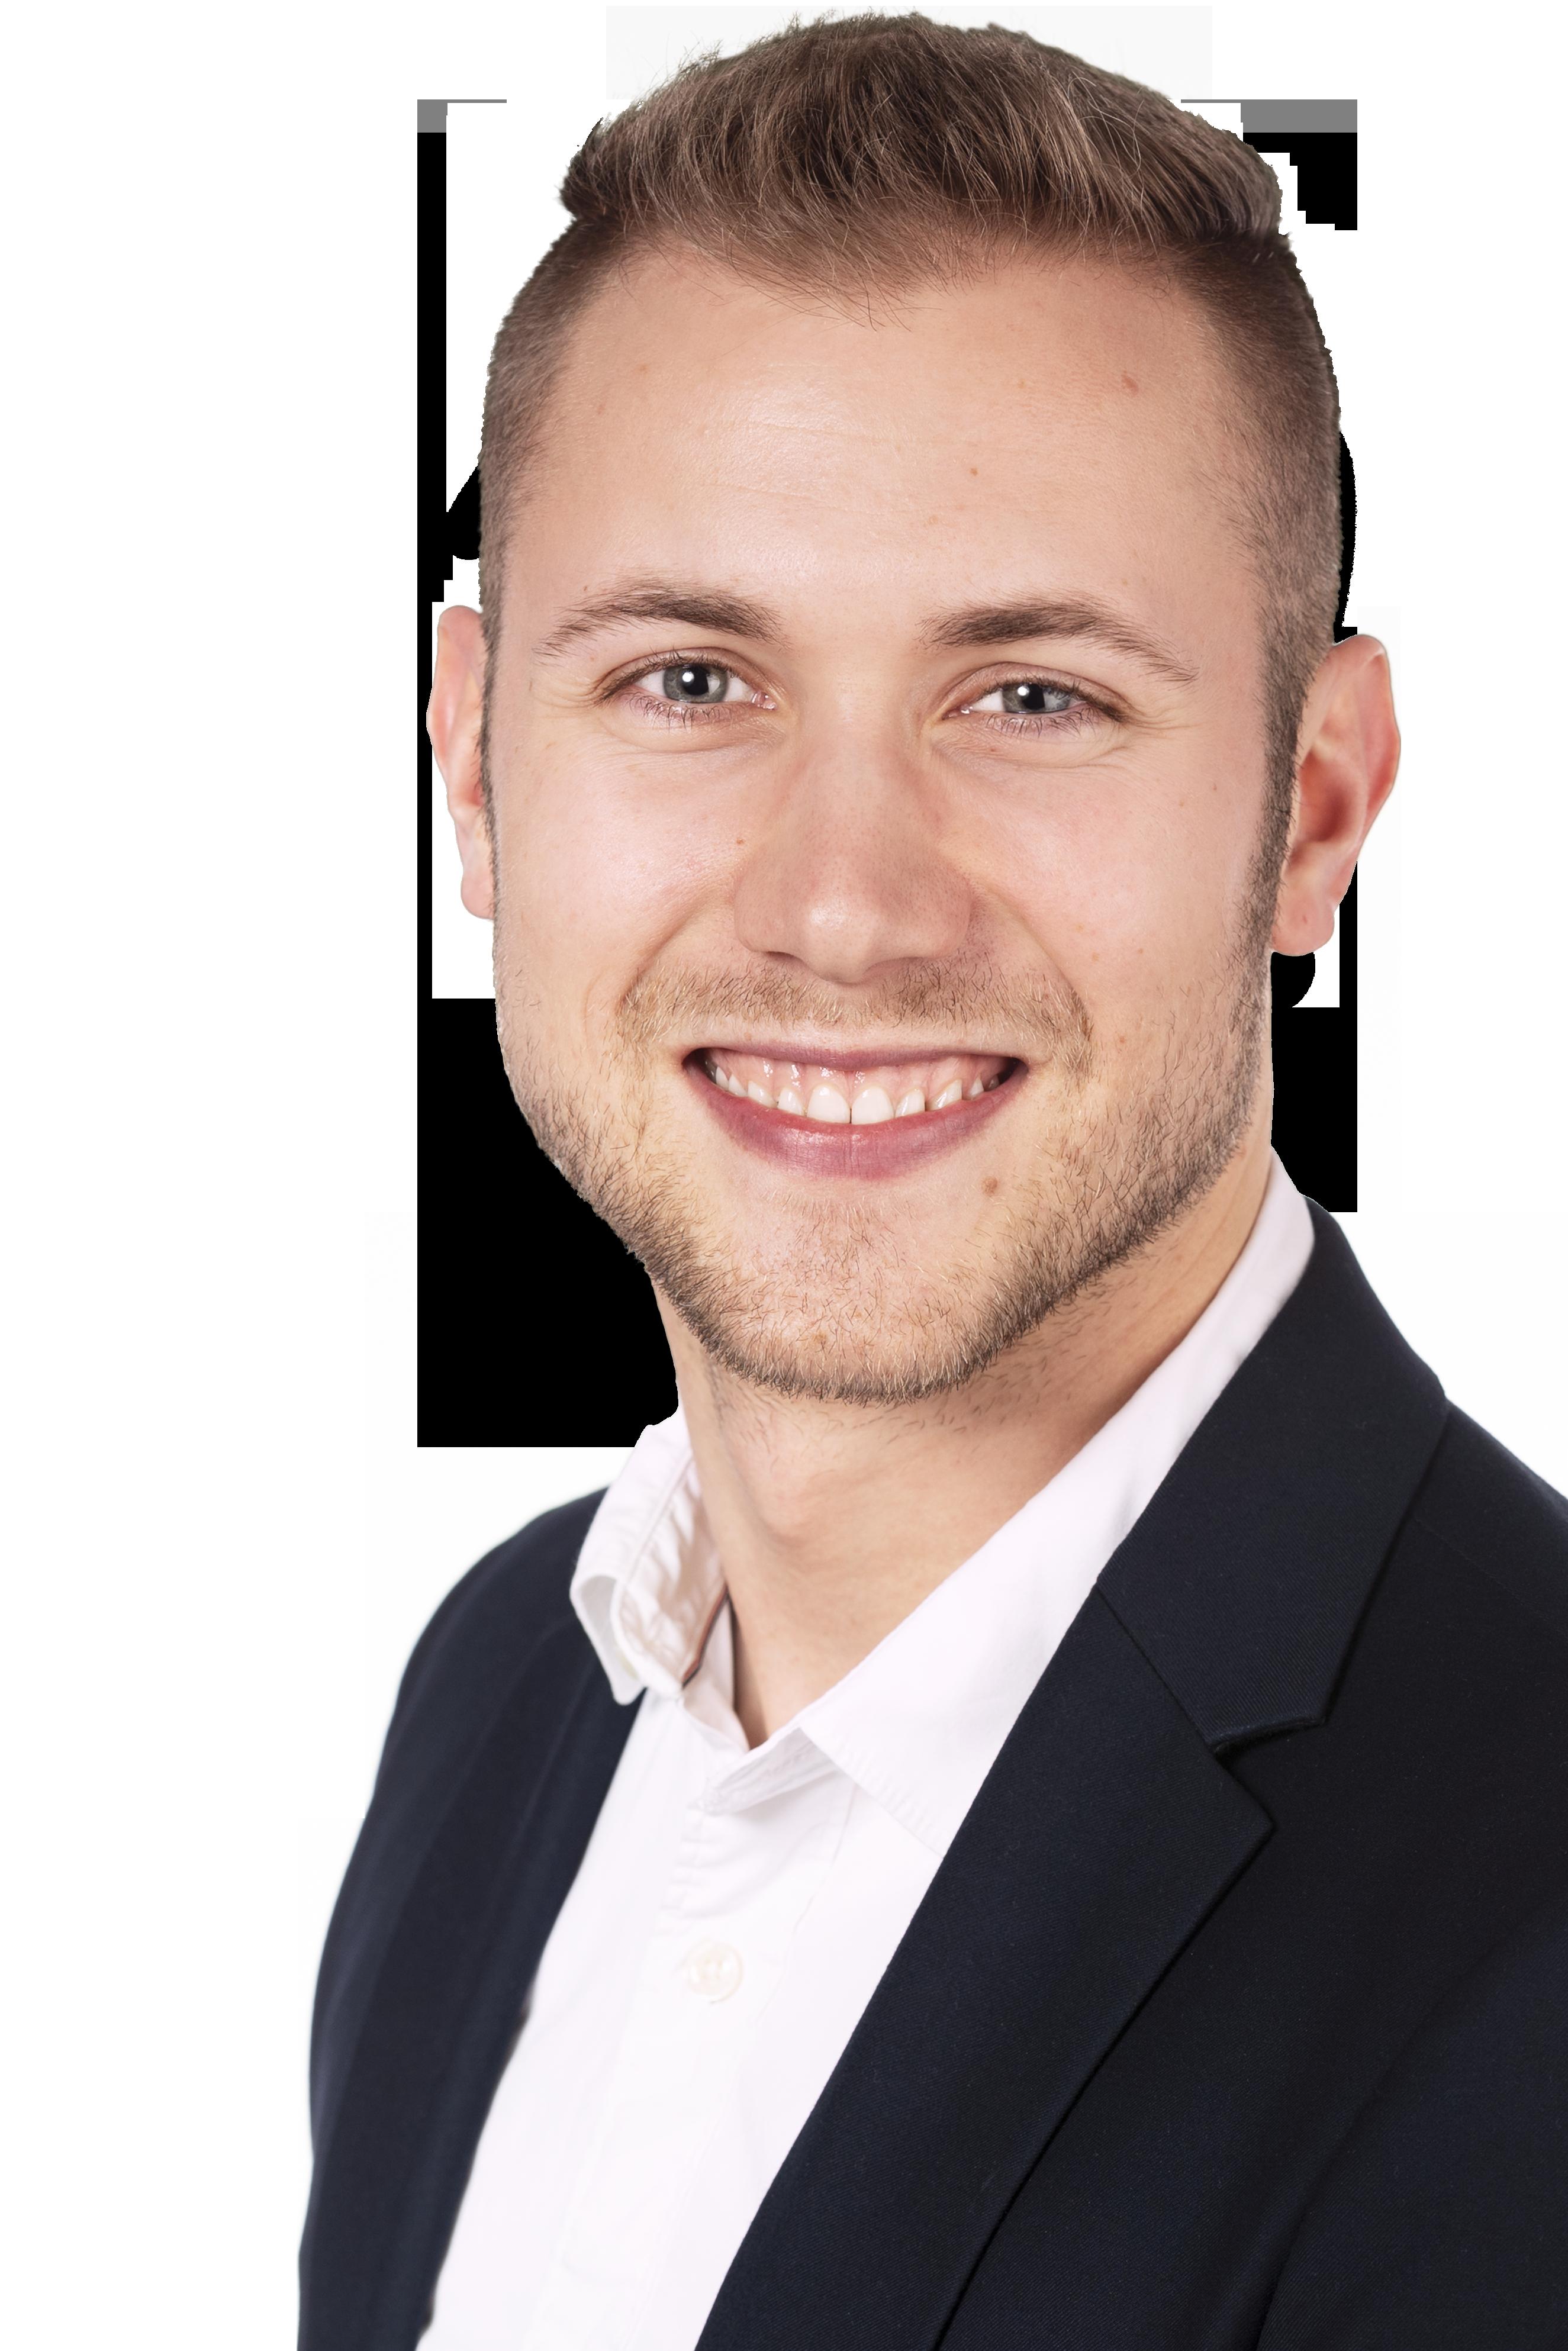 Fabian Kolthoff